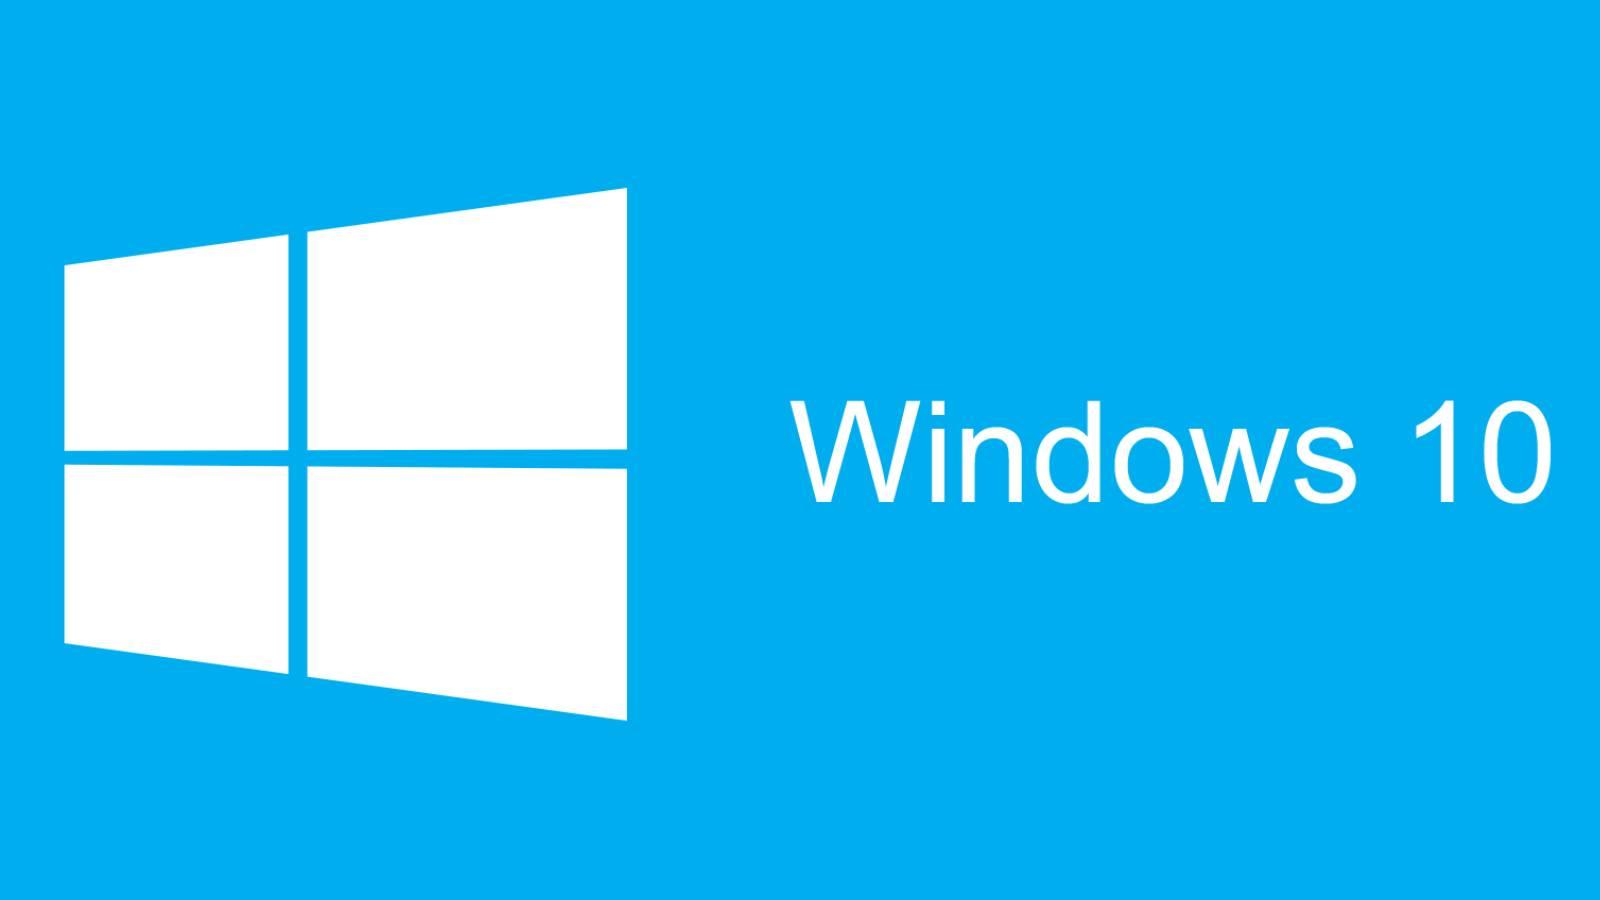 Windows 10 cadere